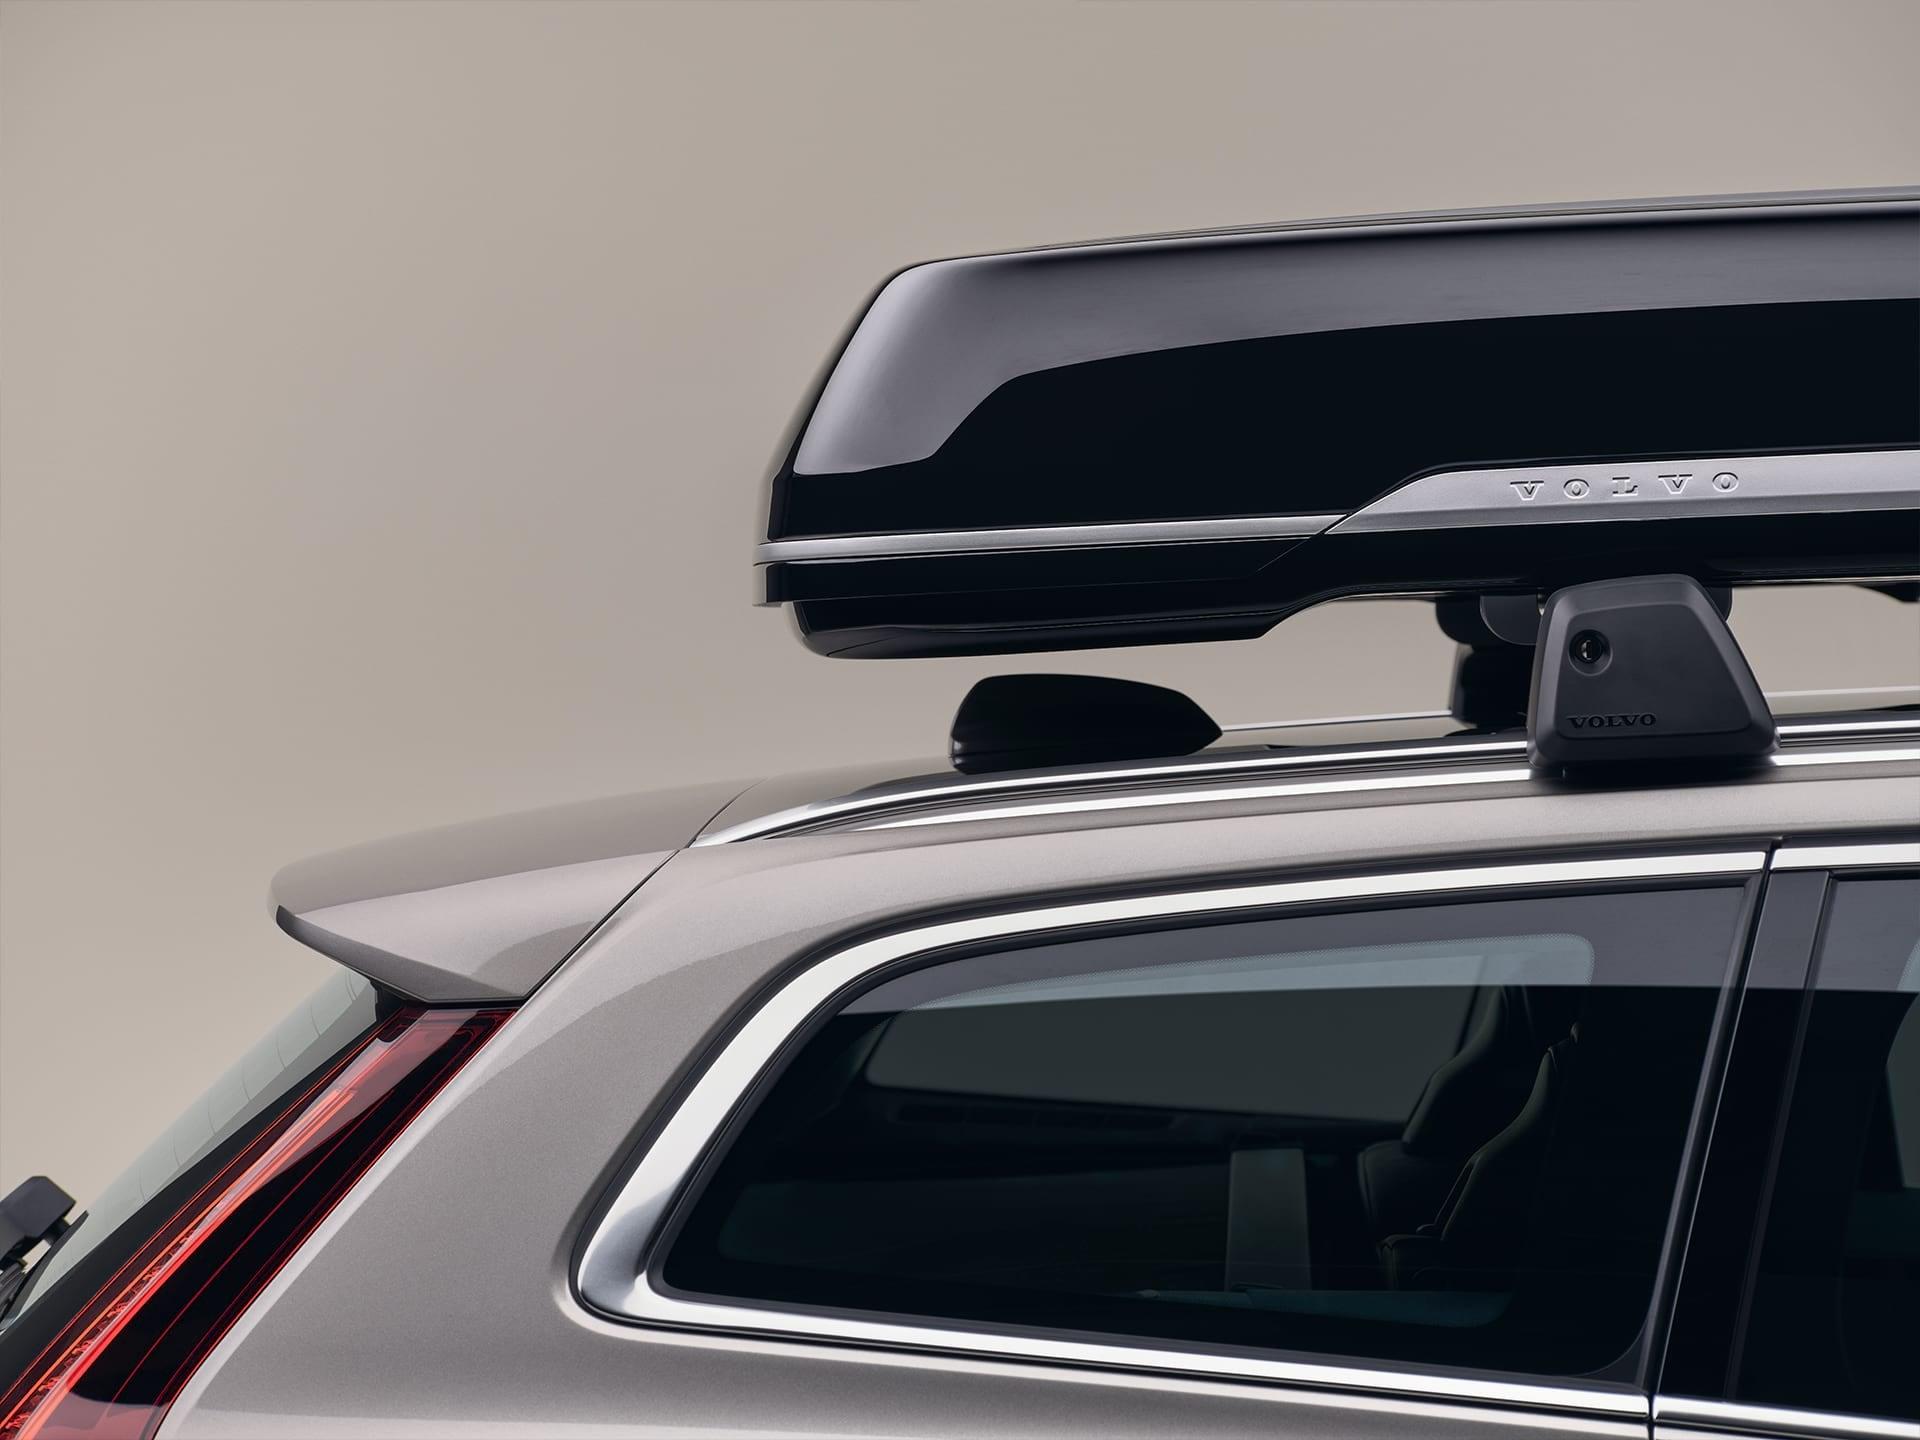 Volvo V60 караван со кровен багажник.